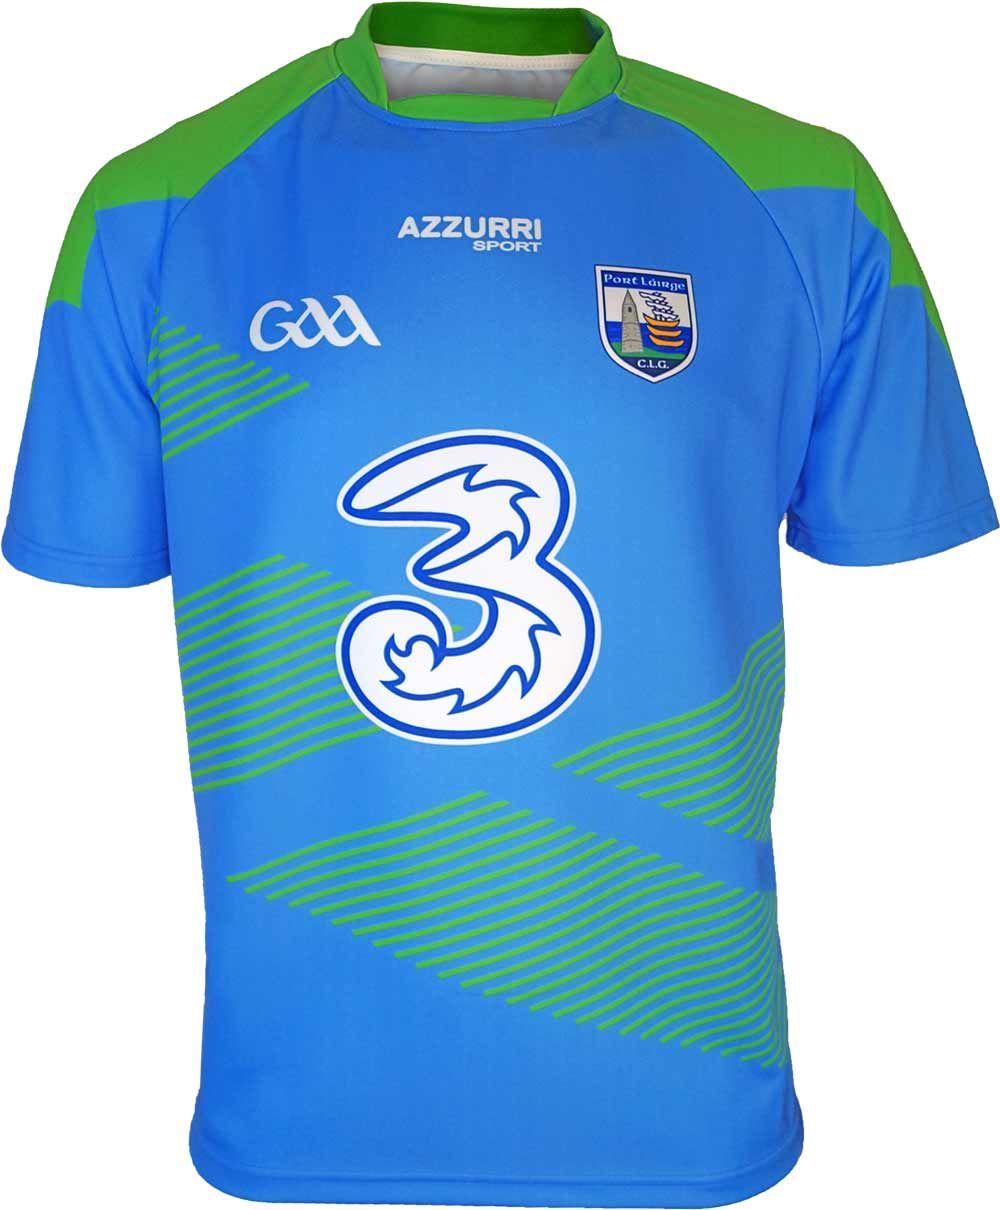 Azzurri Sport Waterford GAA Ladies Jersey Mens tops